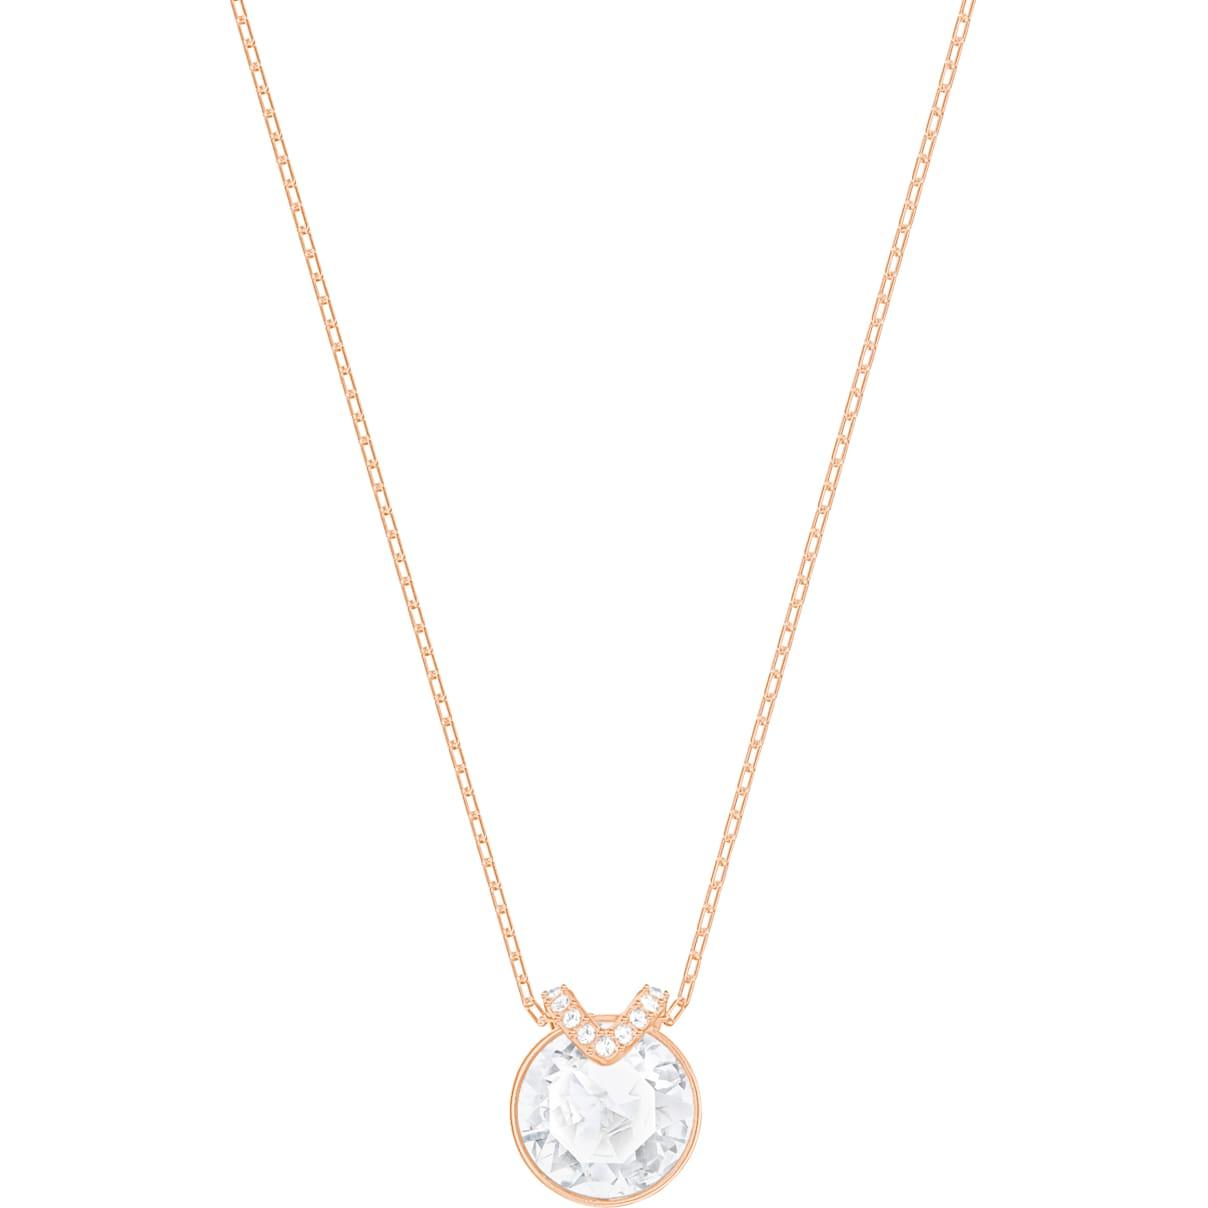 Swarovski Bella V Pendant, White, Rose-gold tone plated